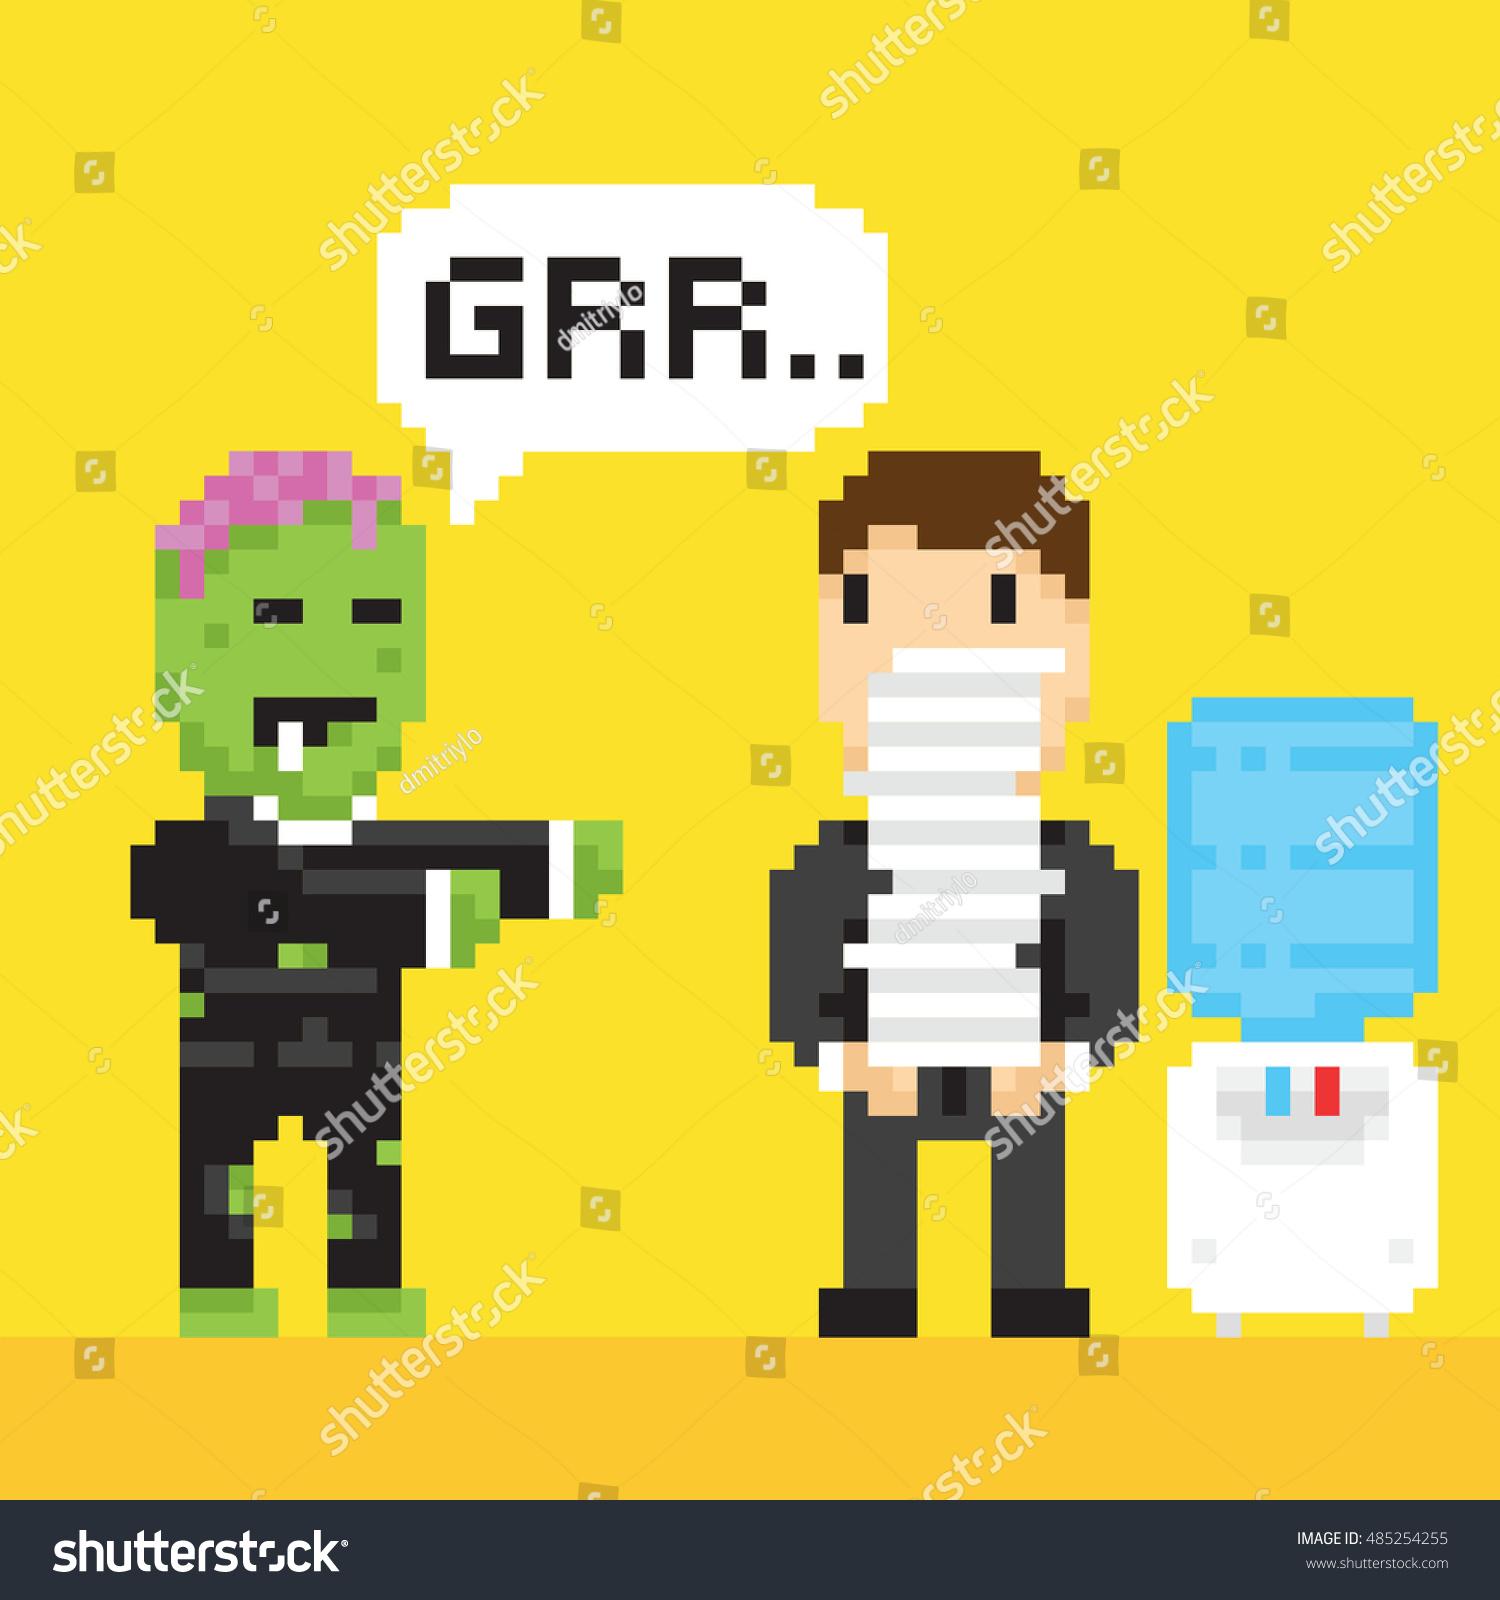 Pixel Art Game Style Halloween Scary Stock Vector